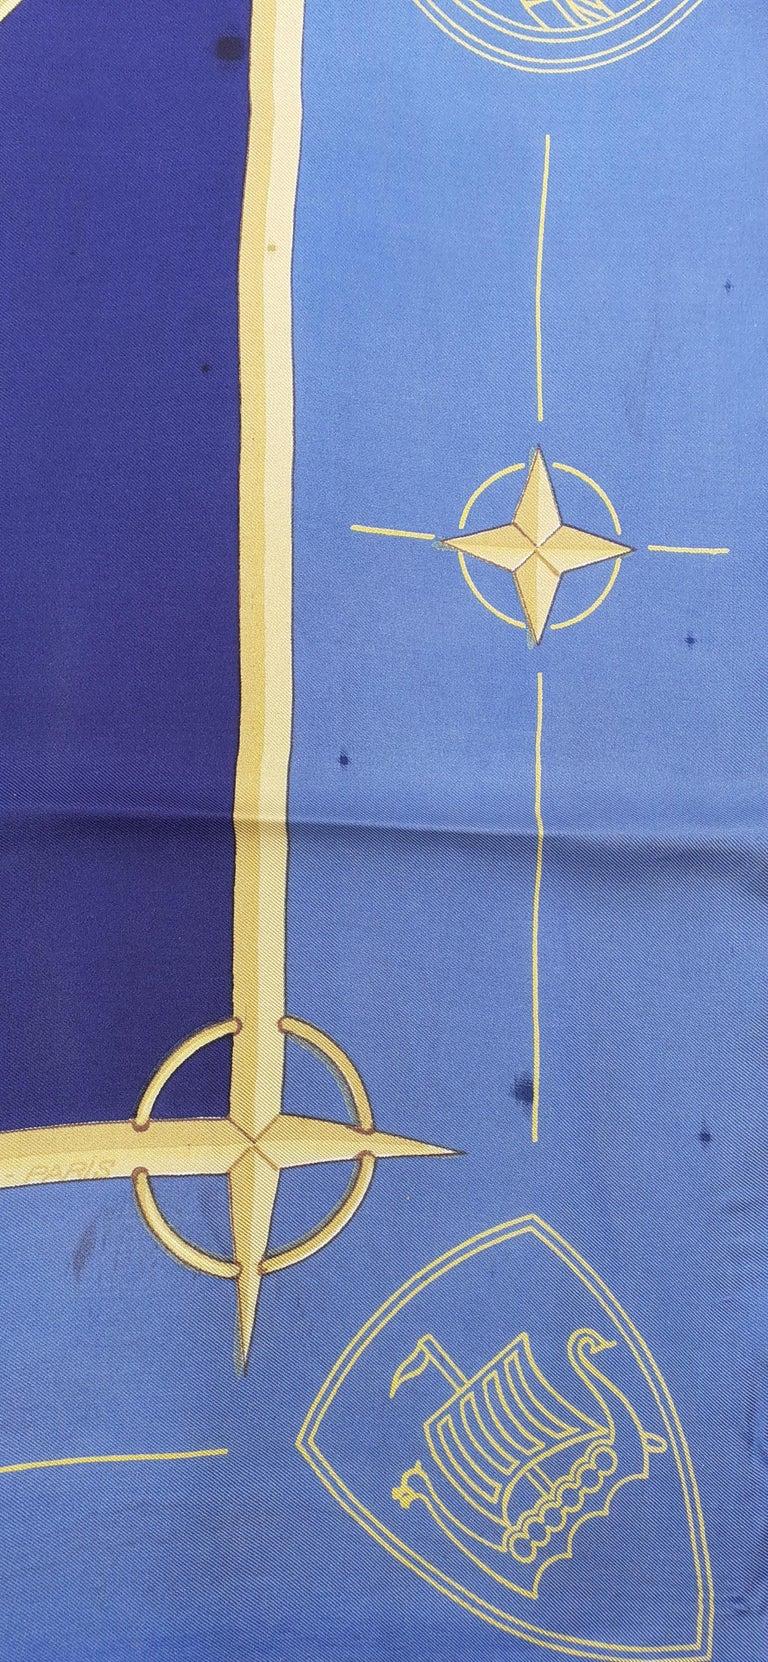 Exceptional Hermès Vintage Silk Scarf OTAN NATO Hugo Grygkar 1956 RARE For Sale 7